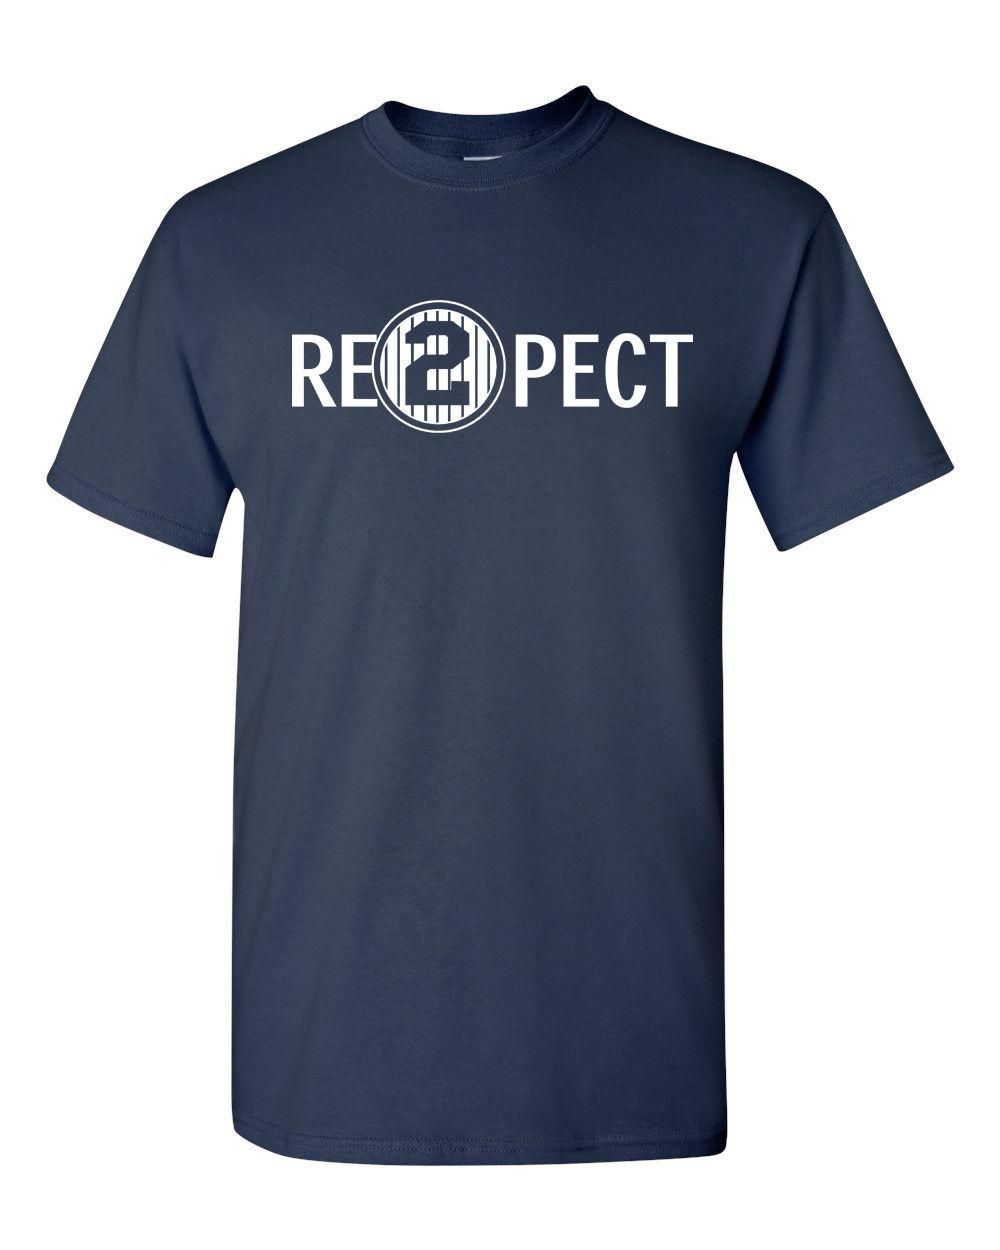 LEQEMAO Quality Print New Summer Style Cotton Respect 2 Re2pect Derek Jeter Captain Ny Yankees Mens Tee Shirt 1173 ...